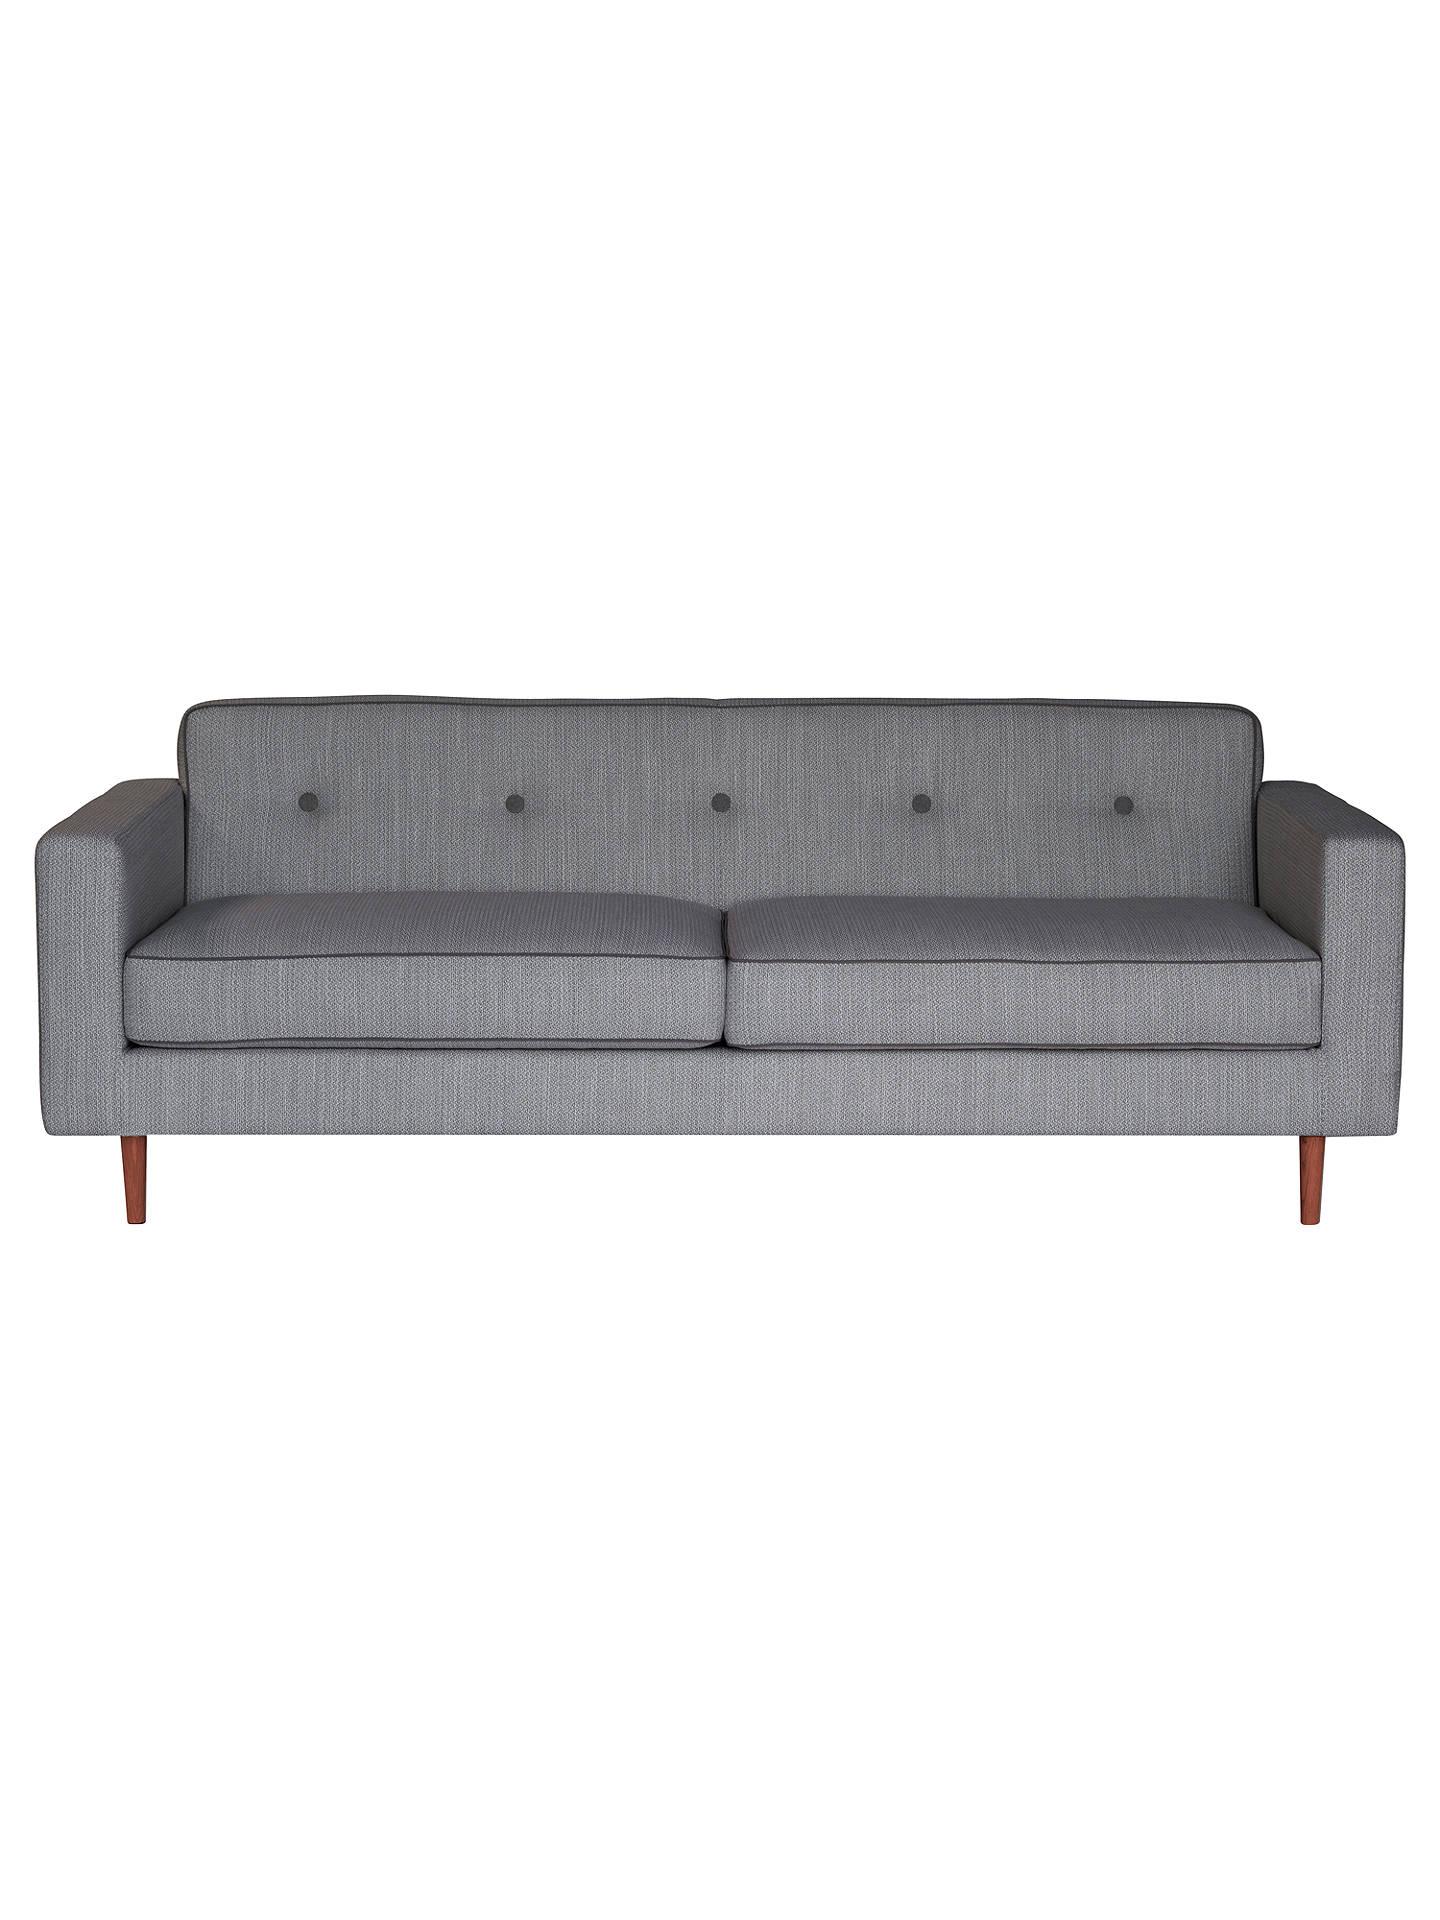 Matthew Hilton For Case Moulton Large Sofa At John Lewis